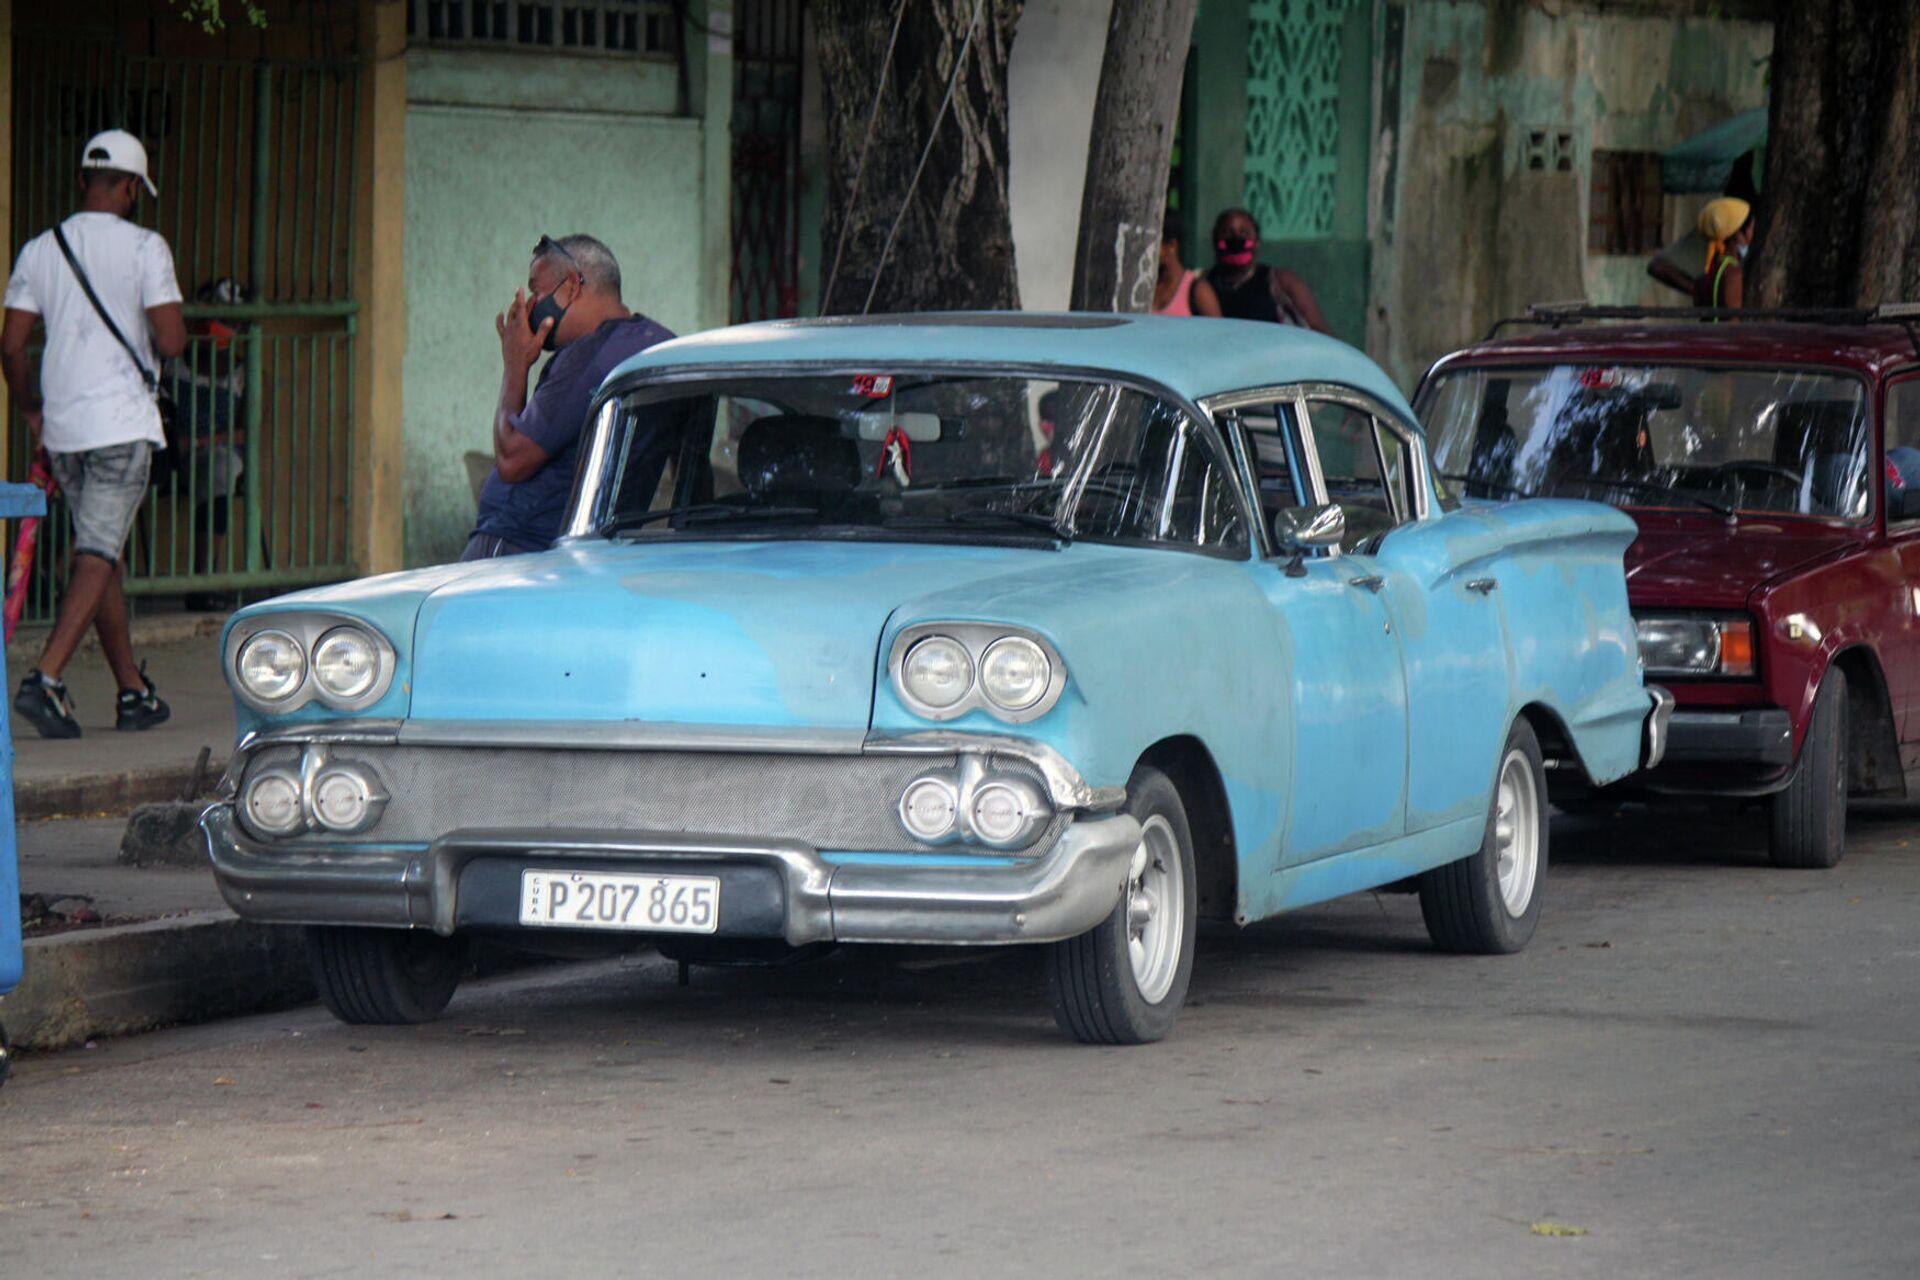 Autos de fabricación estadounidense con más de 65 años de explotación que aun circulan por las calles de Cuba - Sputnik Mundo, 1920, 05.10.2021